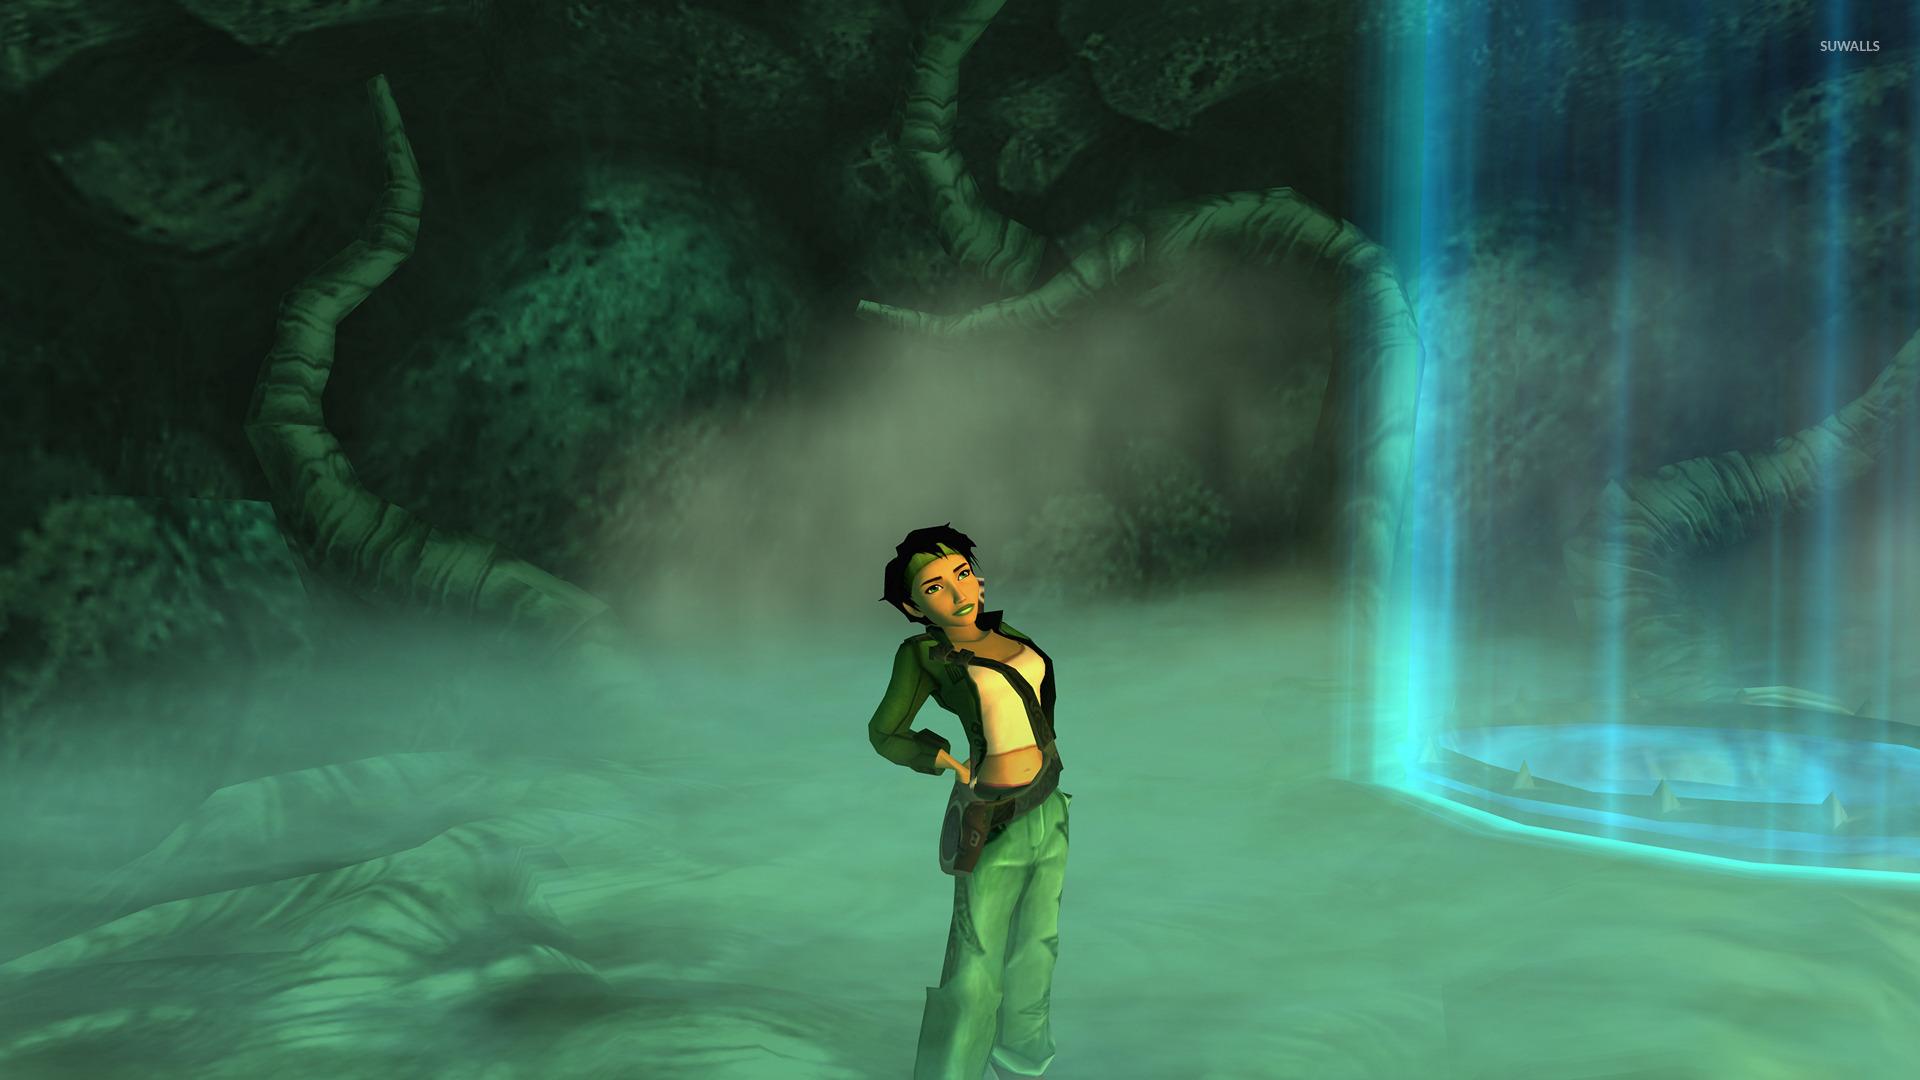 Jade Beyond Good And Evil 2 3 Wallpaper Game Wallpapers 21130